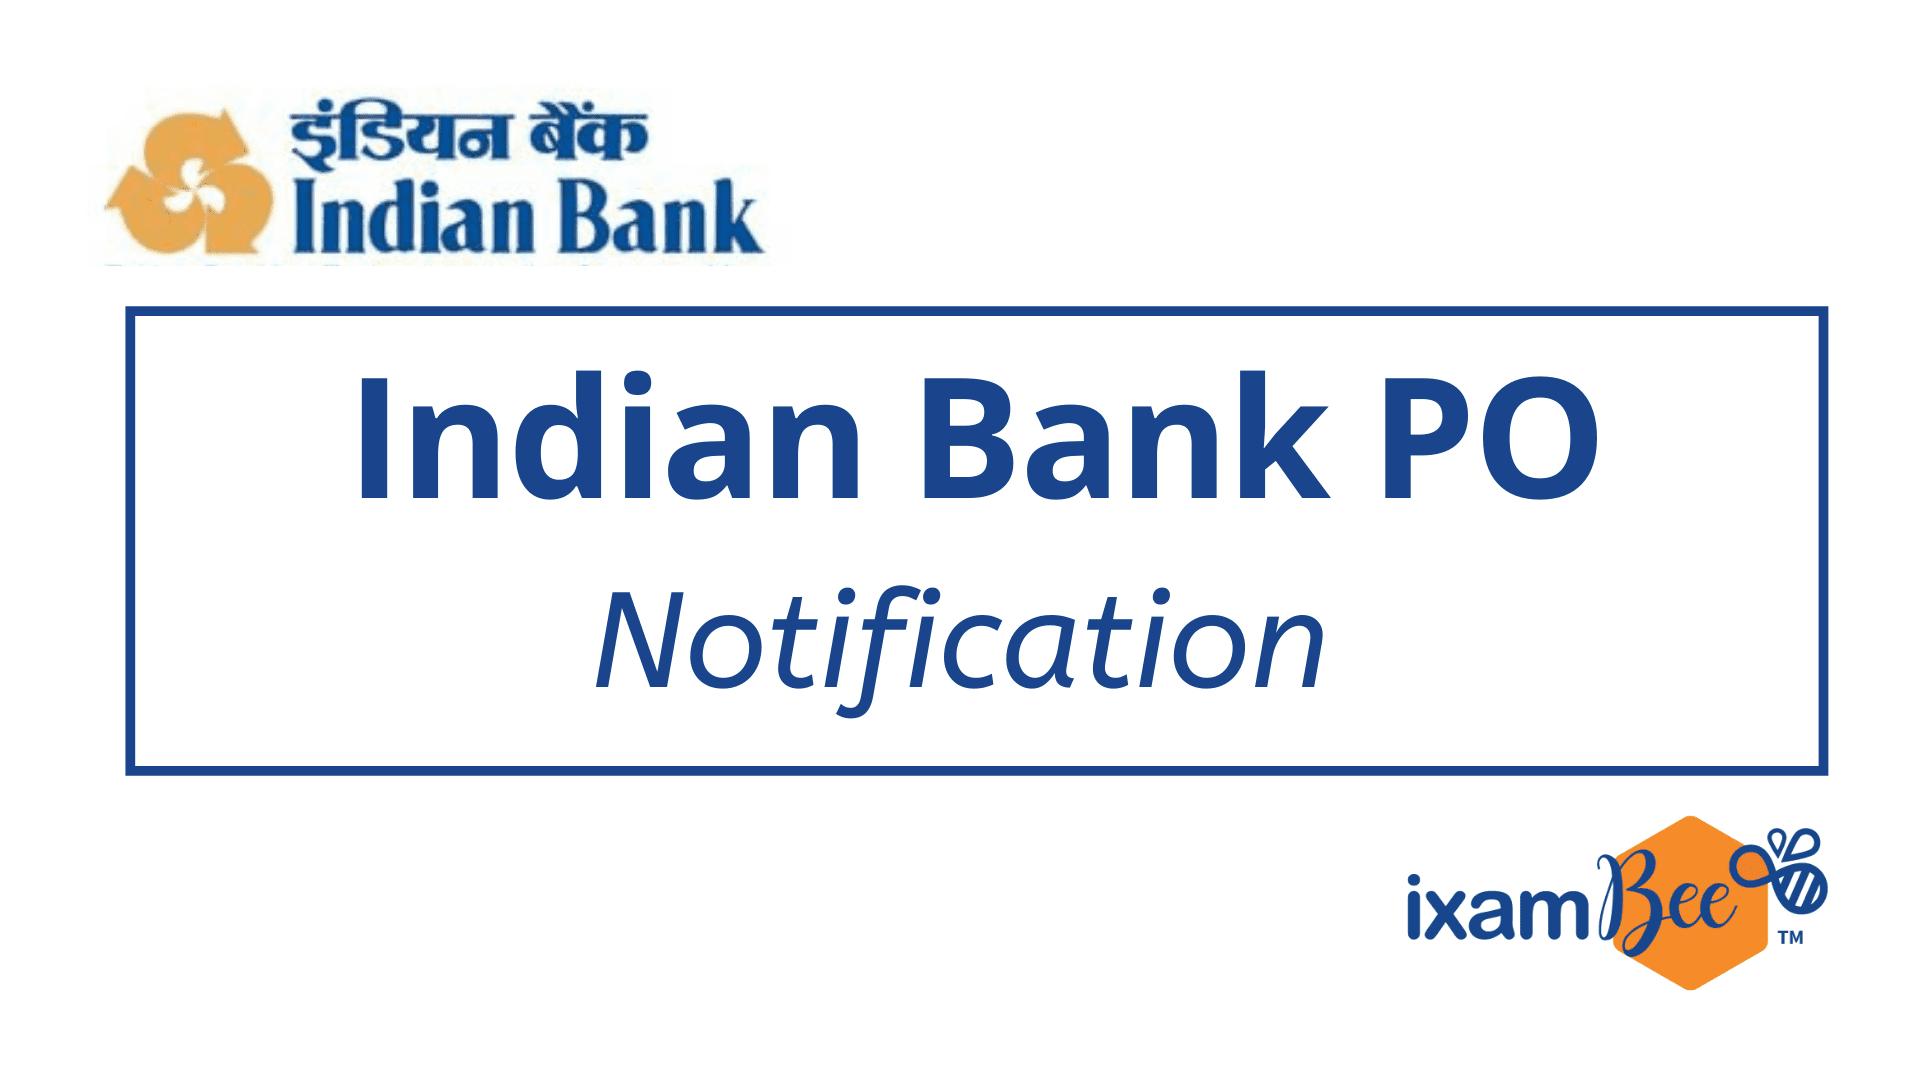 Indian Bank PO Exam Notification